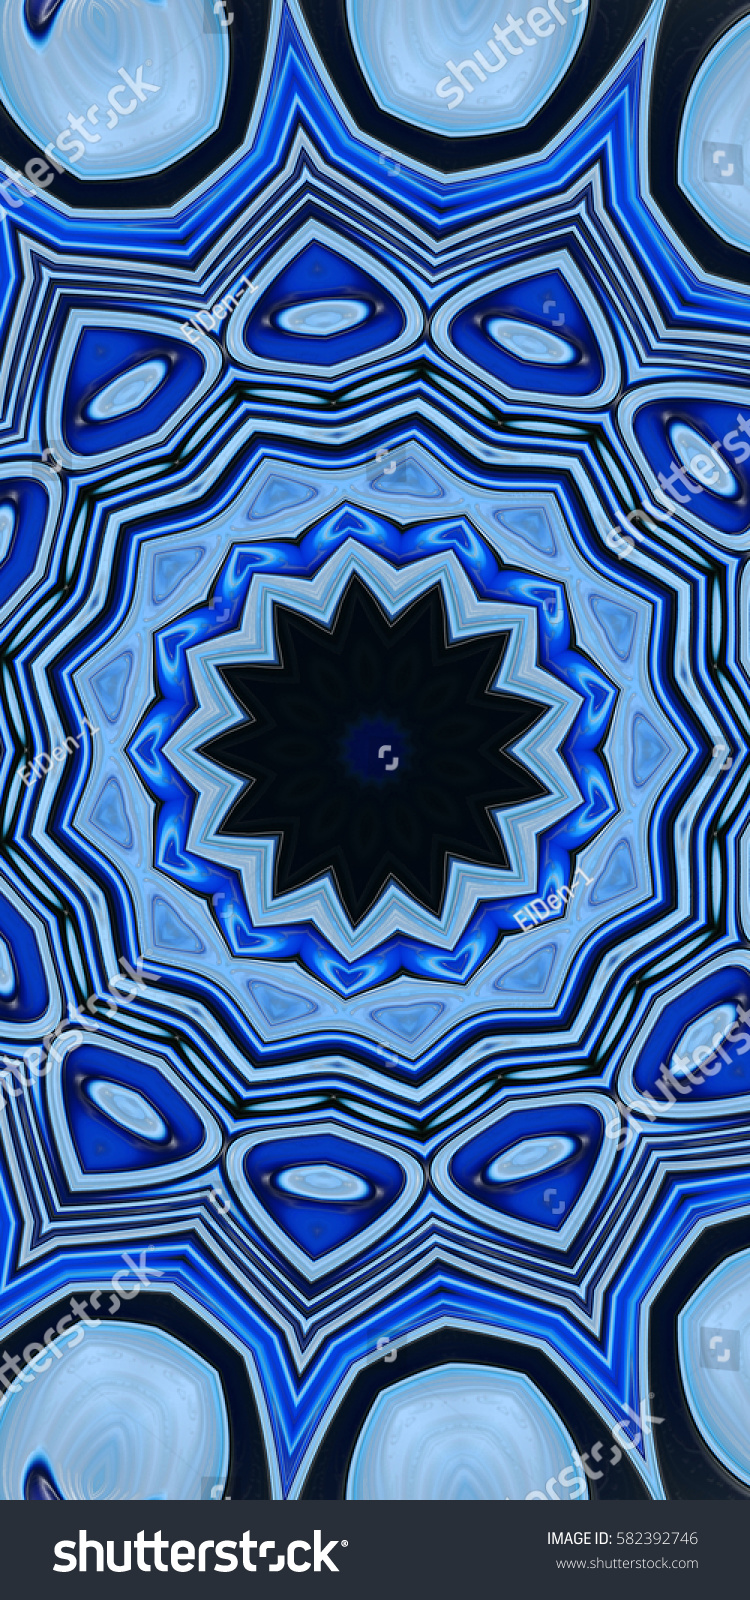 Modern Floral Pattern Decorative Dram Fantasy Stock Illustration